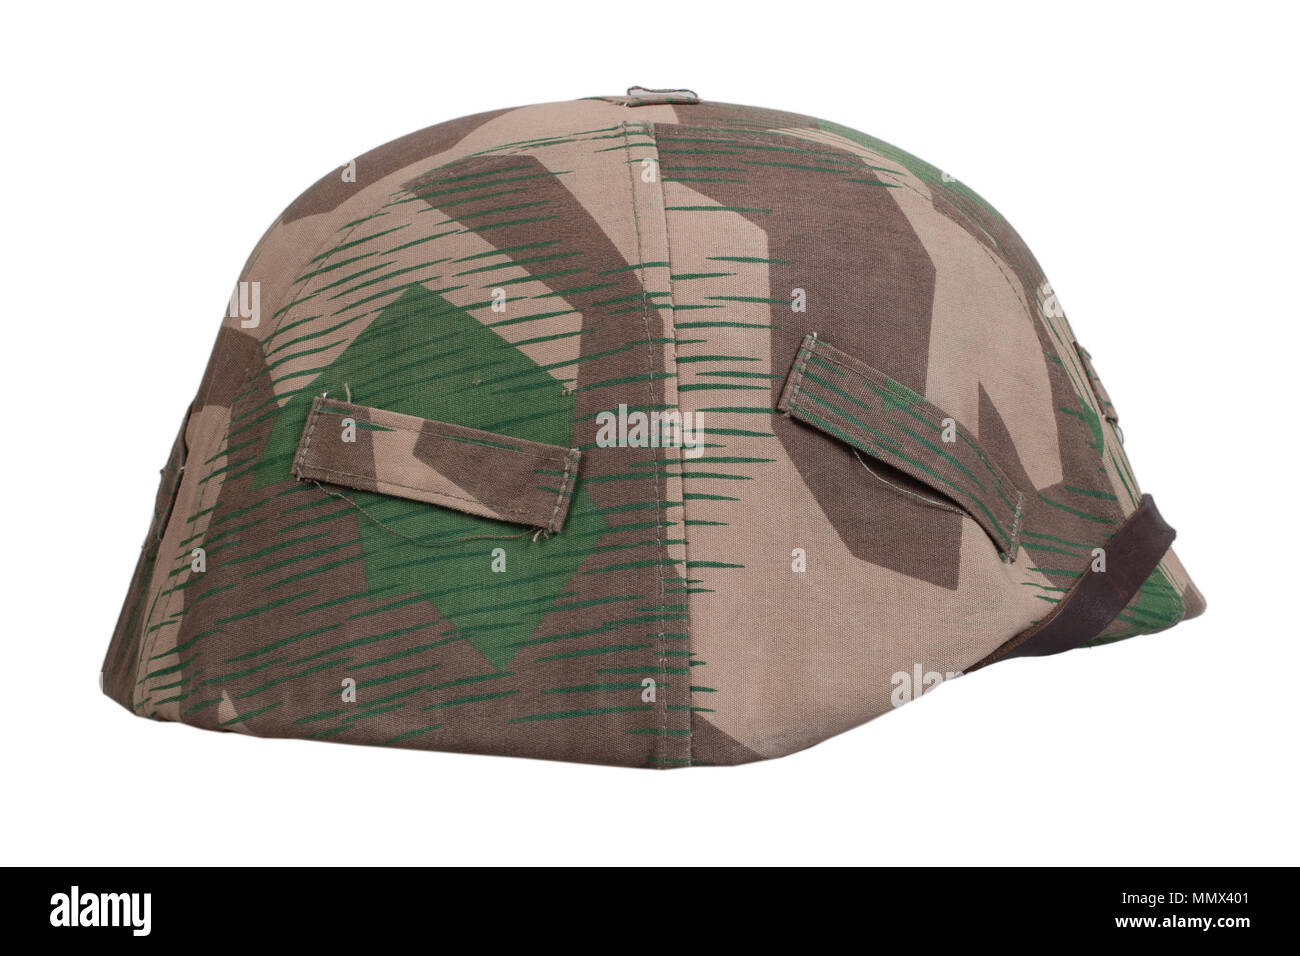 ww2 german army protective helmet - Stock Image